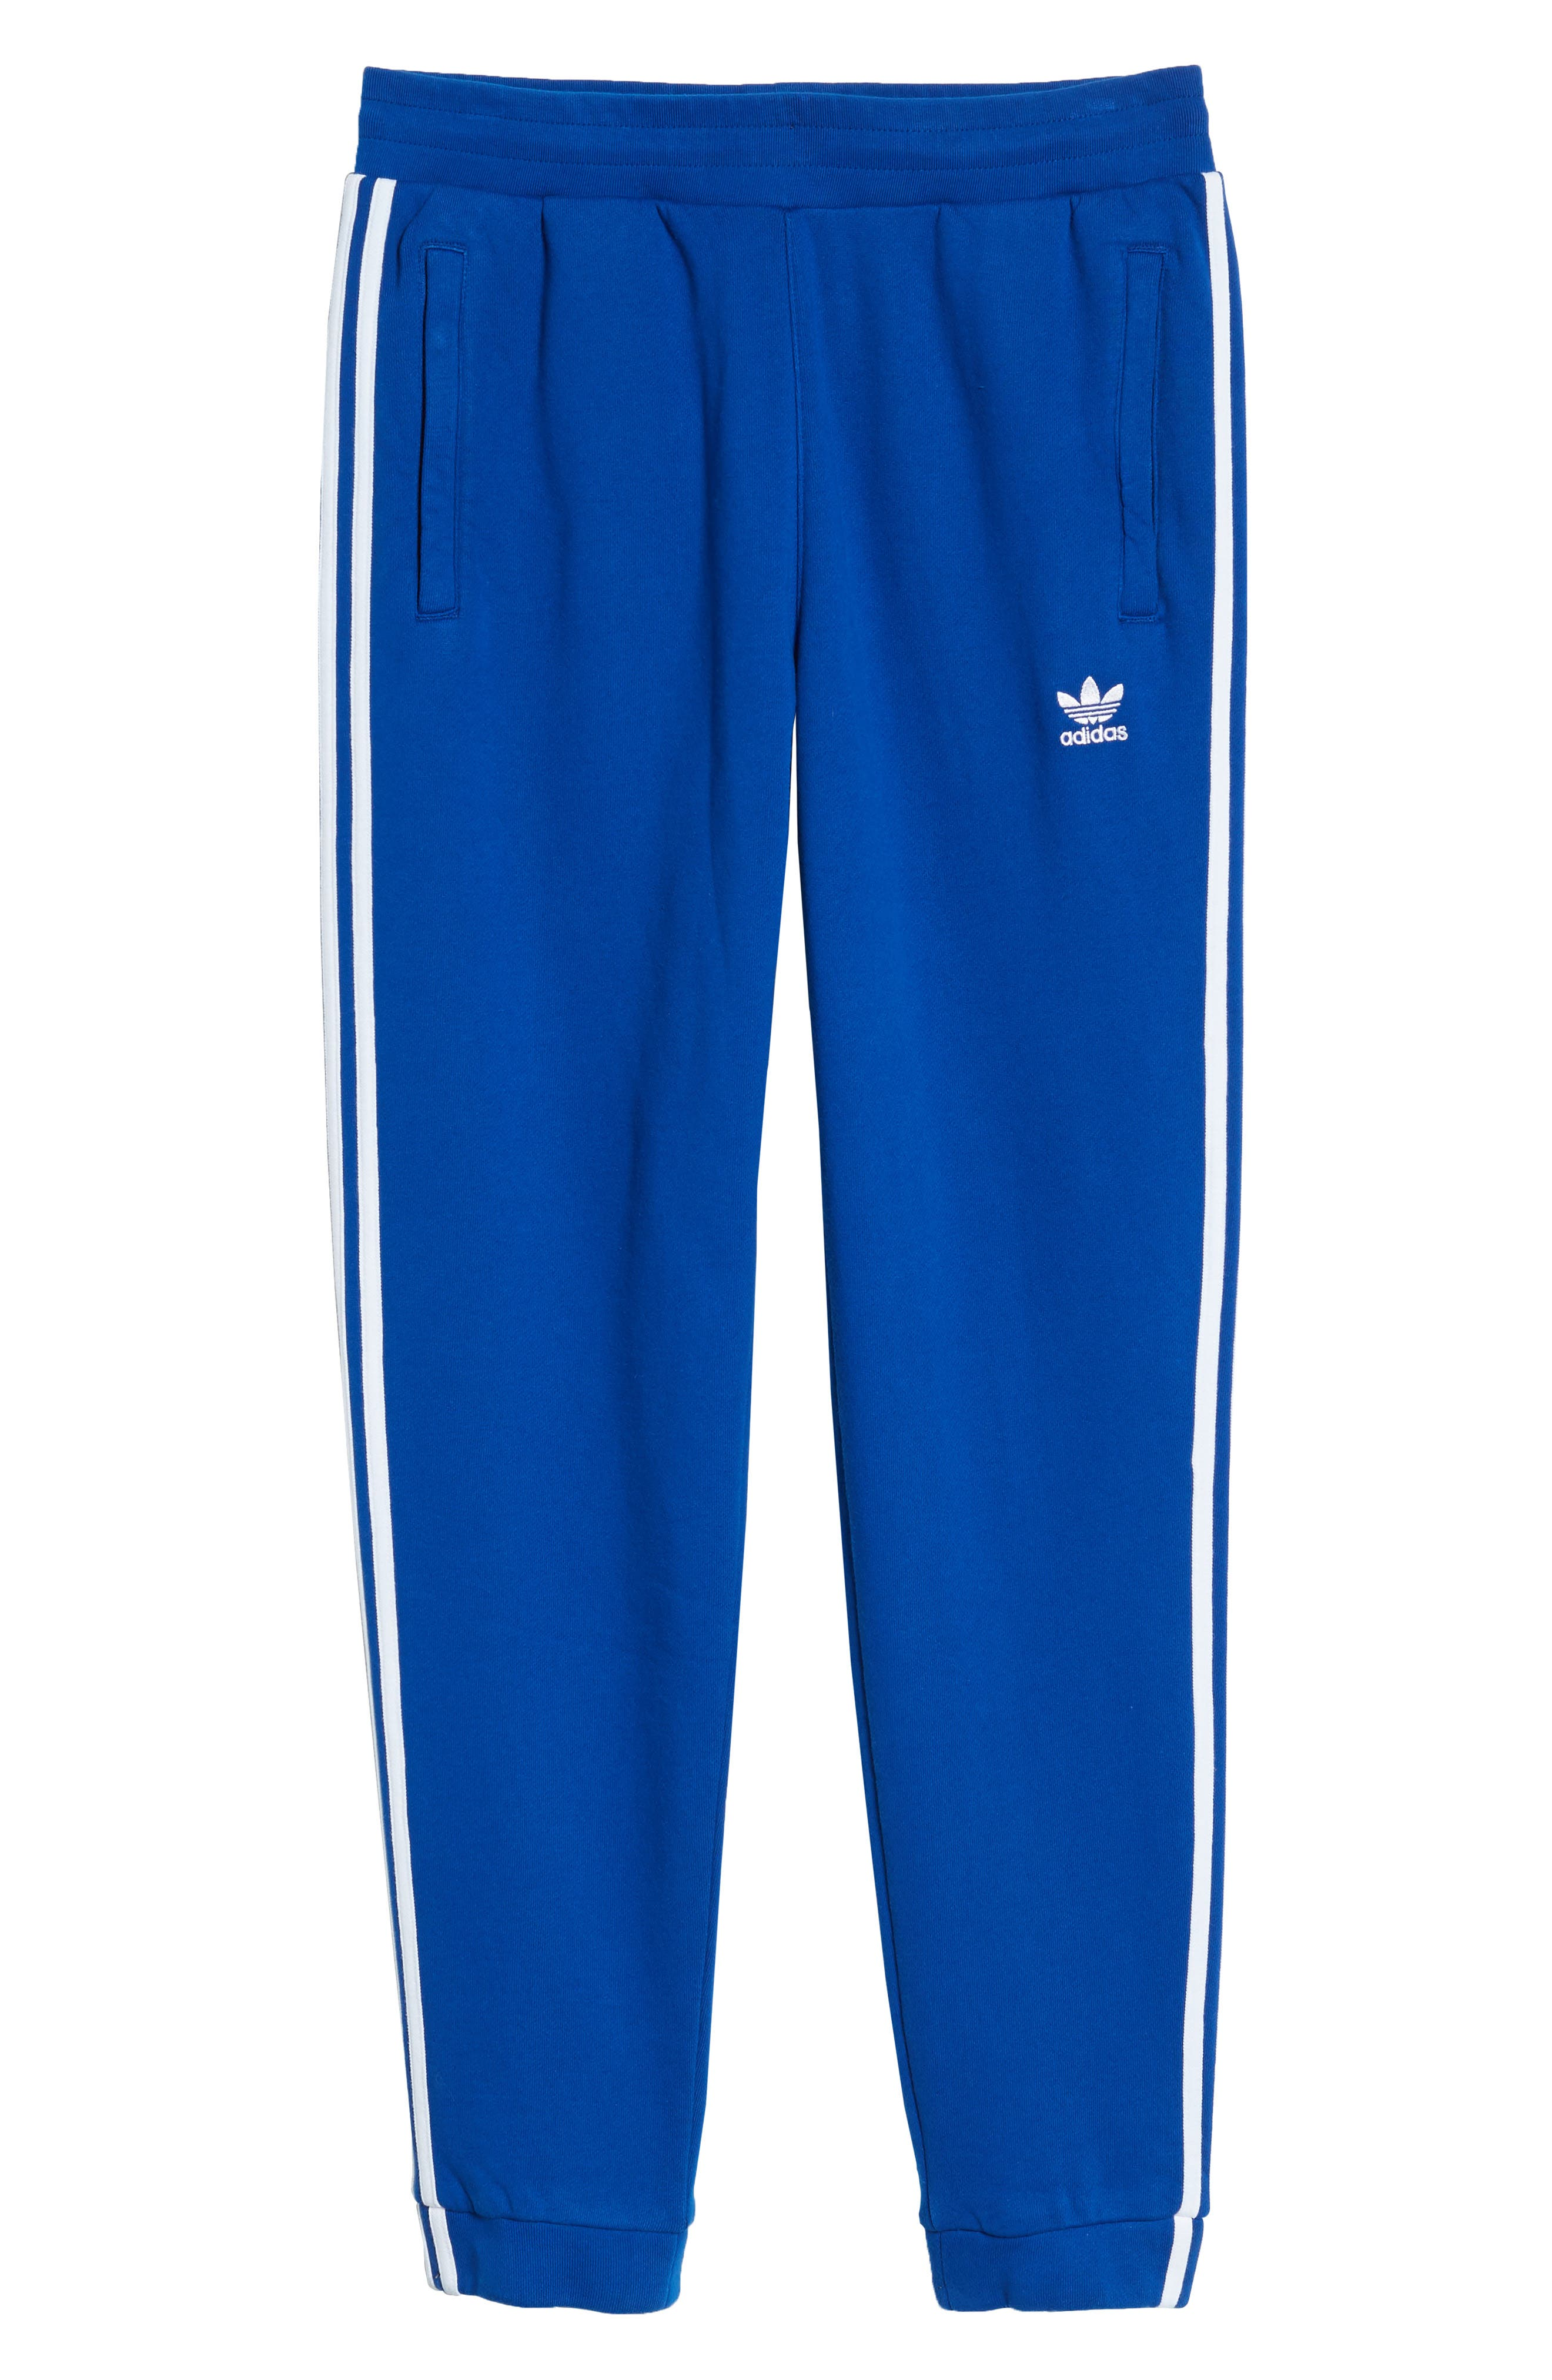 3-Stripes Sweatpants,                             Alternate thumbnail 6, color,                             Collegiate Royal